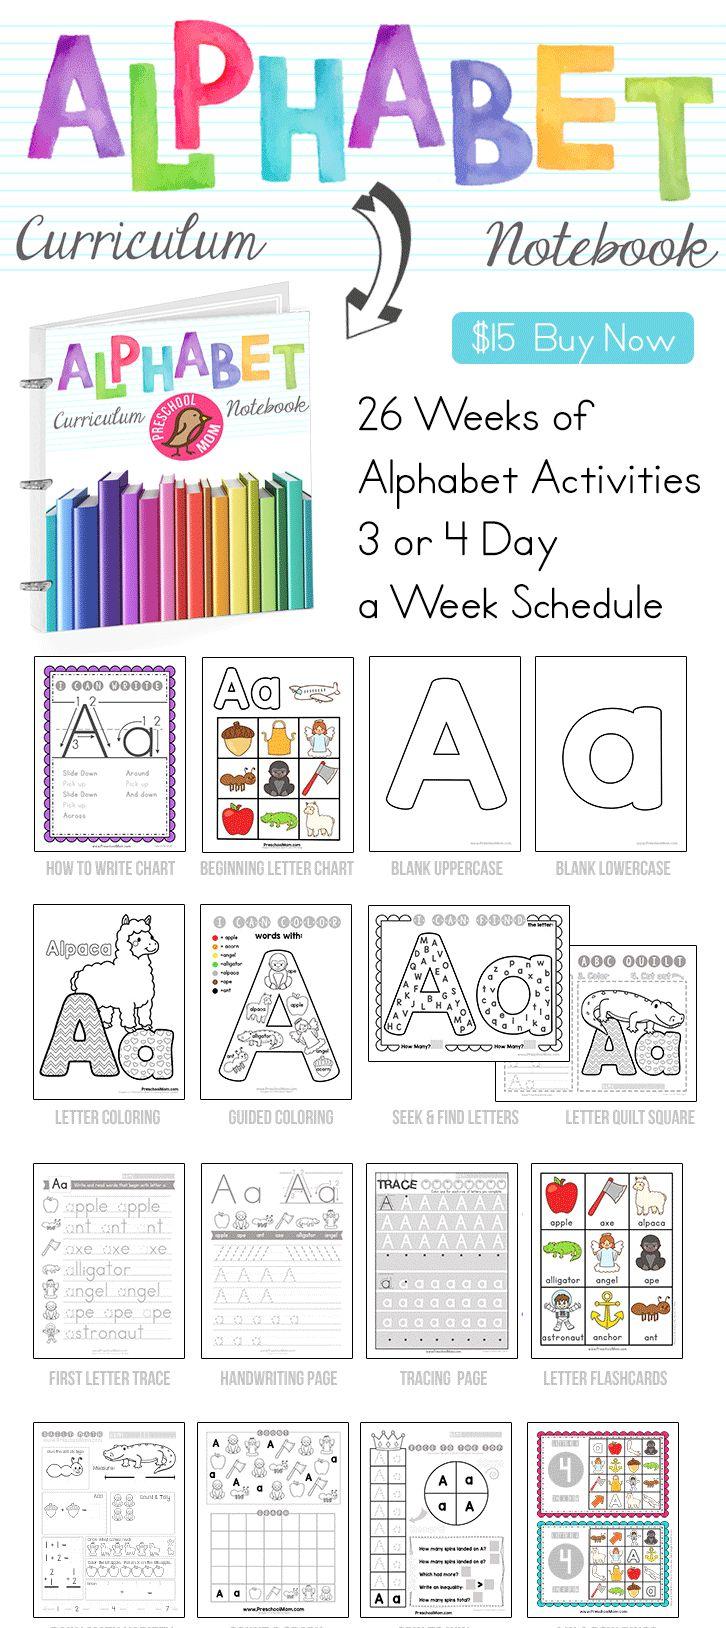 Alphabet Curriculum Notebook Download an Instant Letter